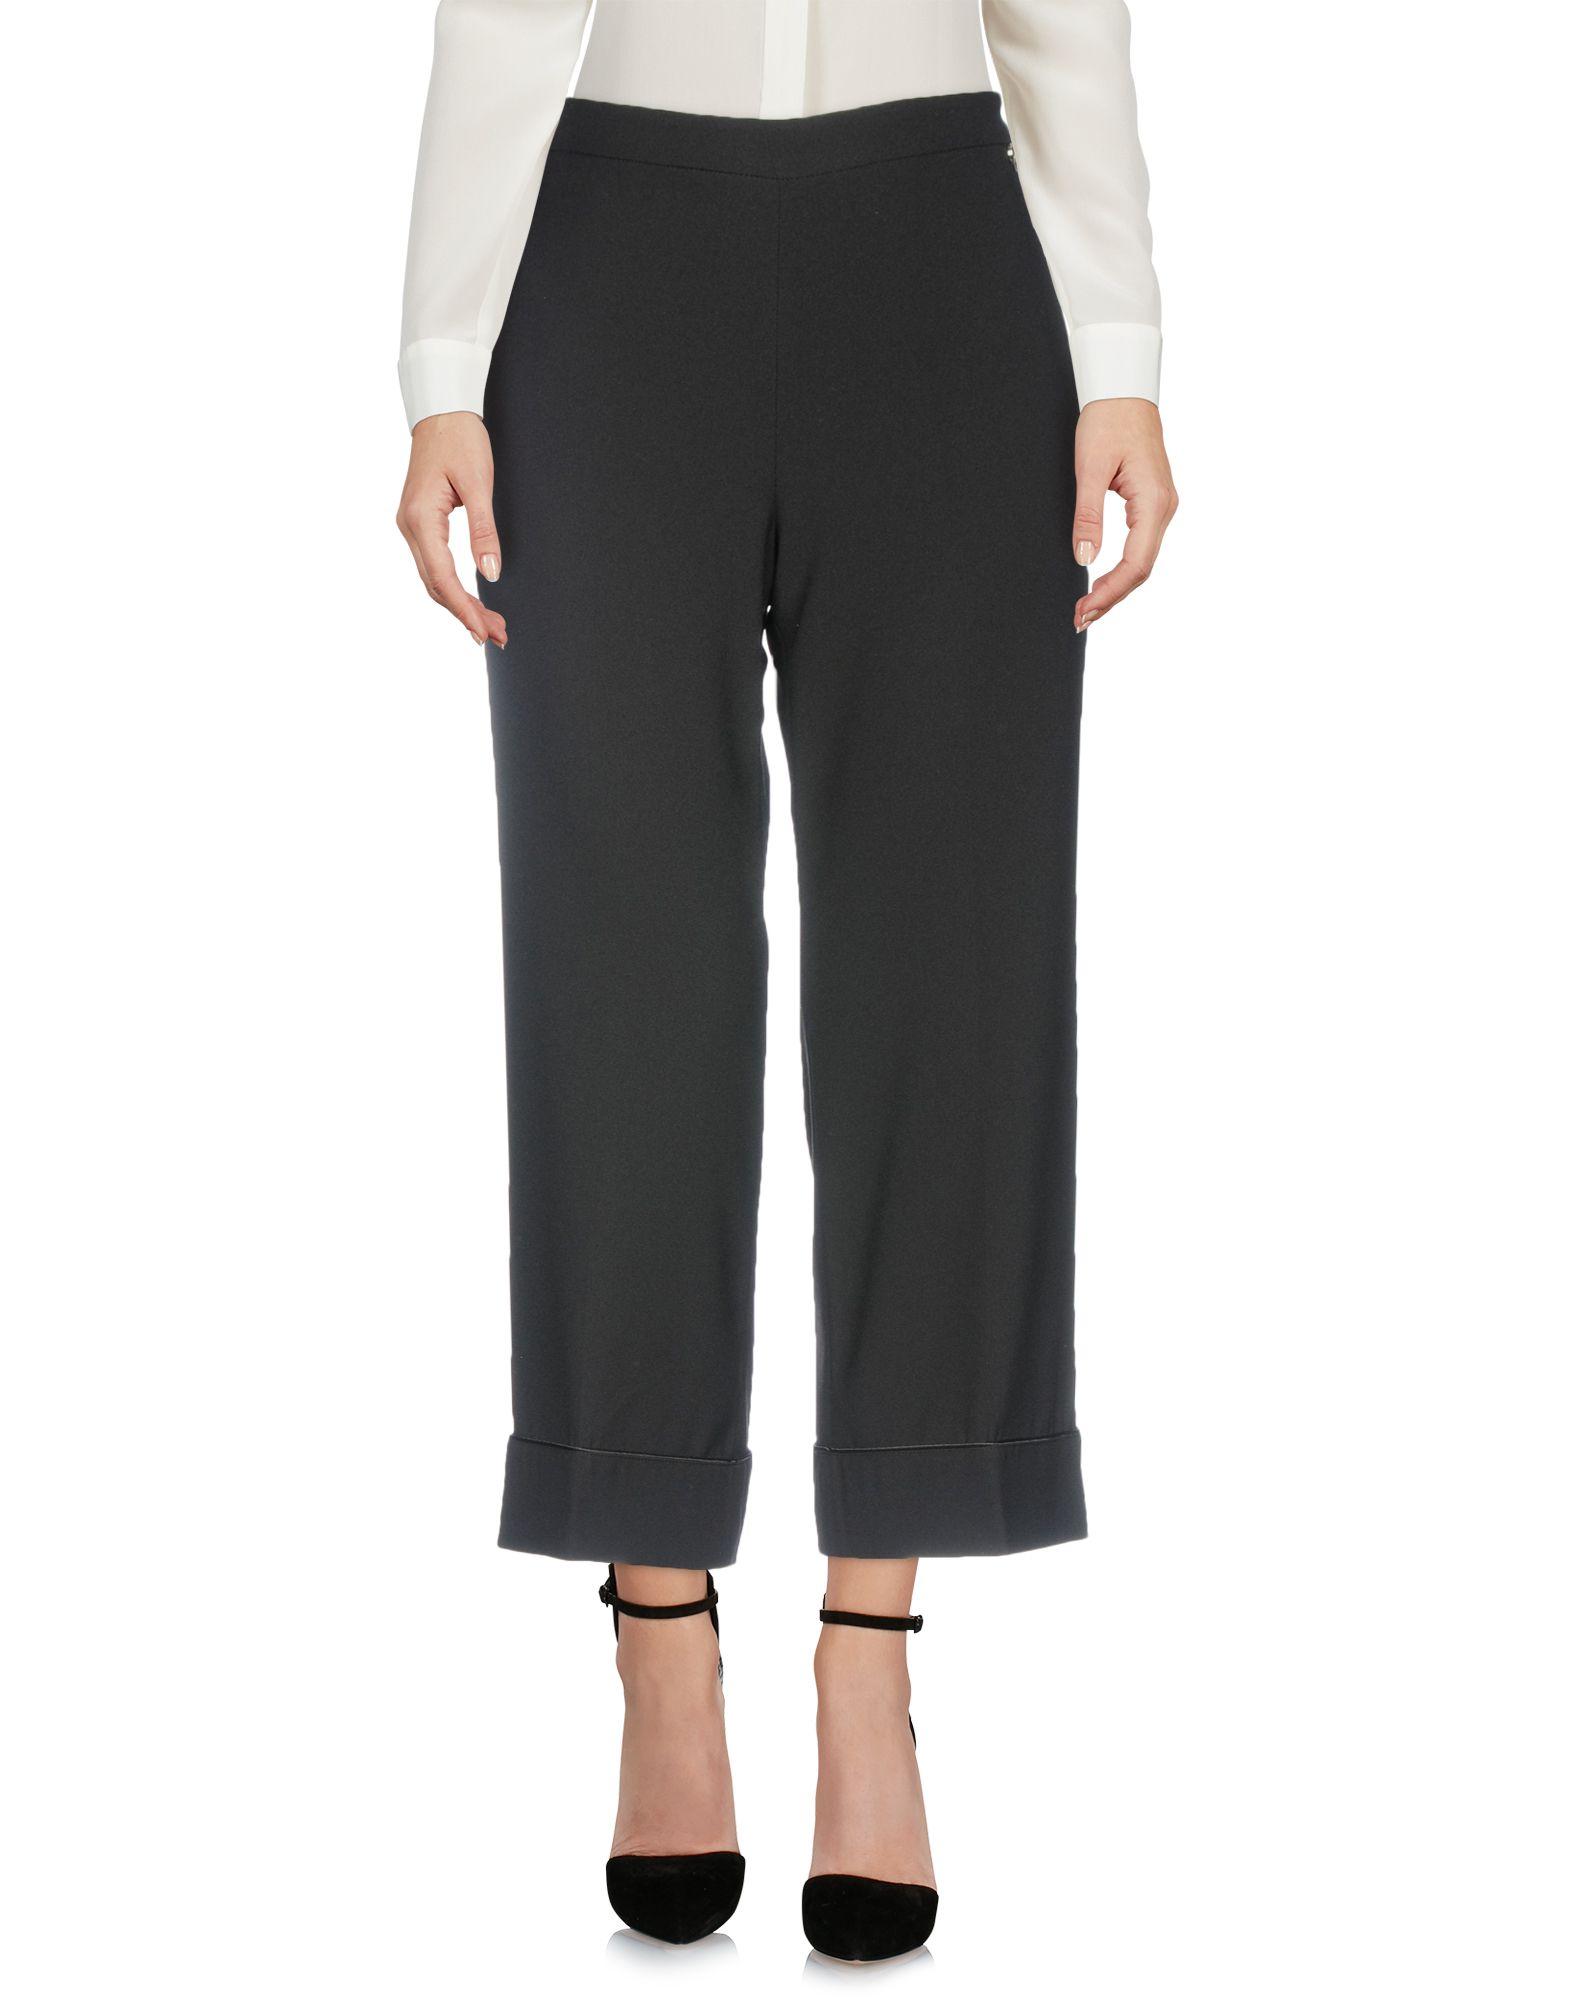 Pantalone Twin-Set Simona Barbieri Donna - Acquista online su 5xoV7uuDIq